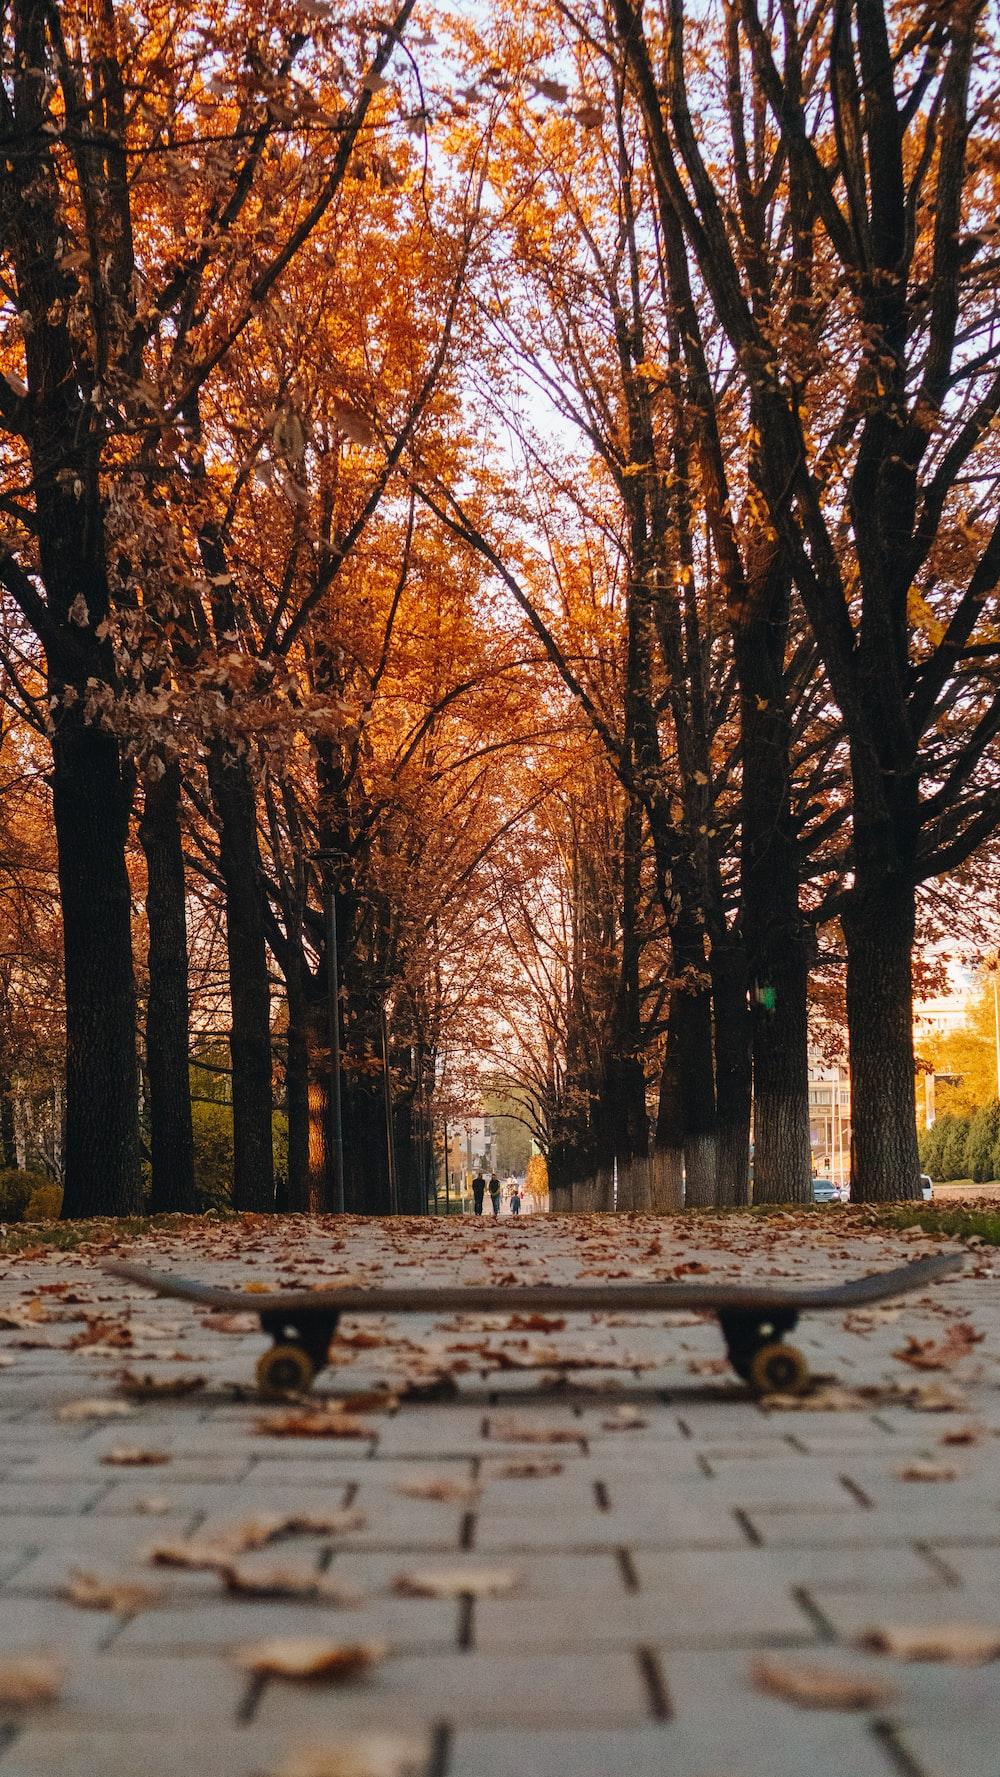 gray and black skateboard photo across orange-leafed trees